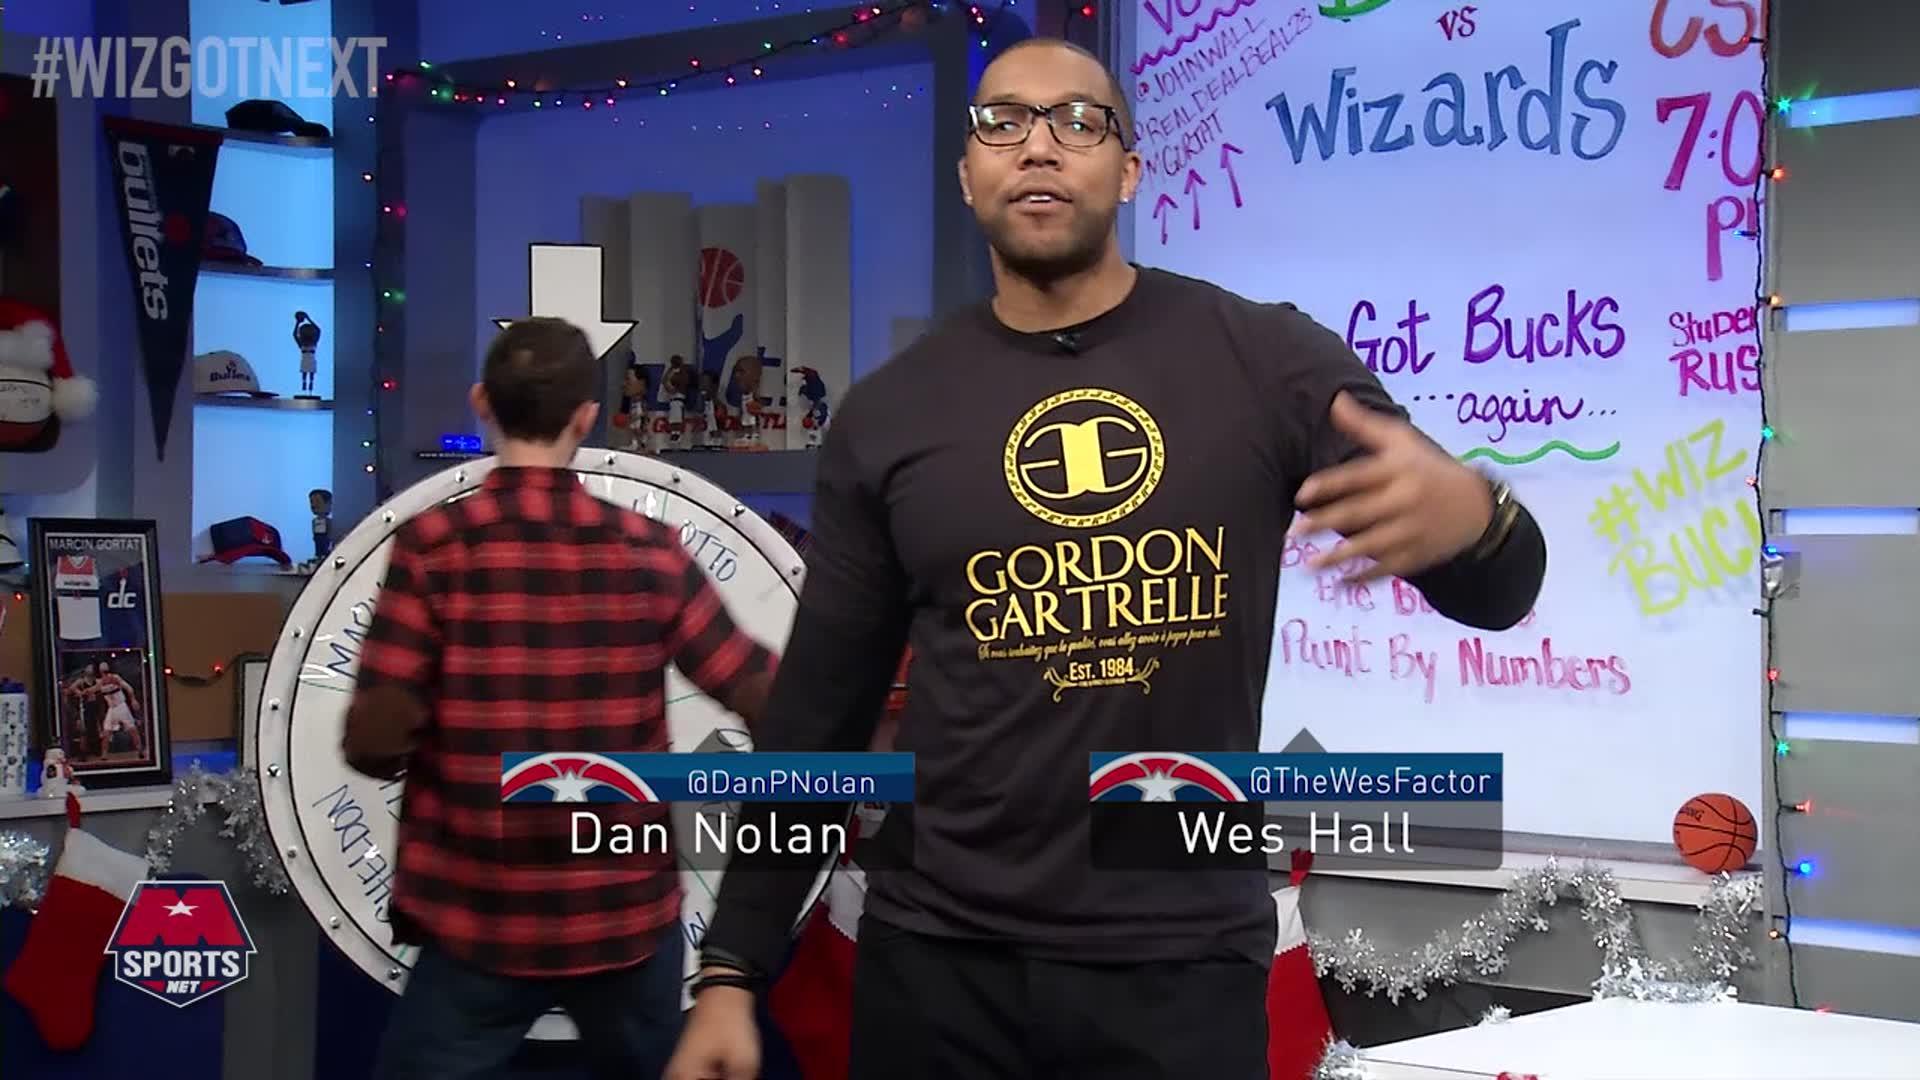 Wiz Got Next: Wizards vs Bucks Pt 1 - 12-26-16